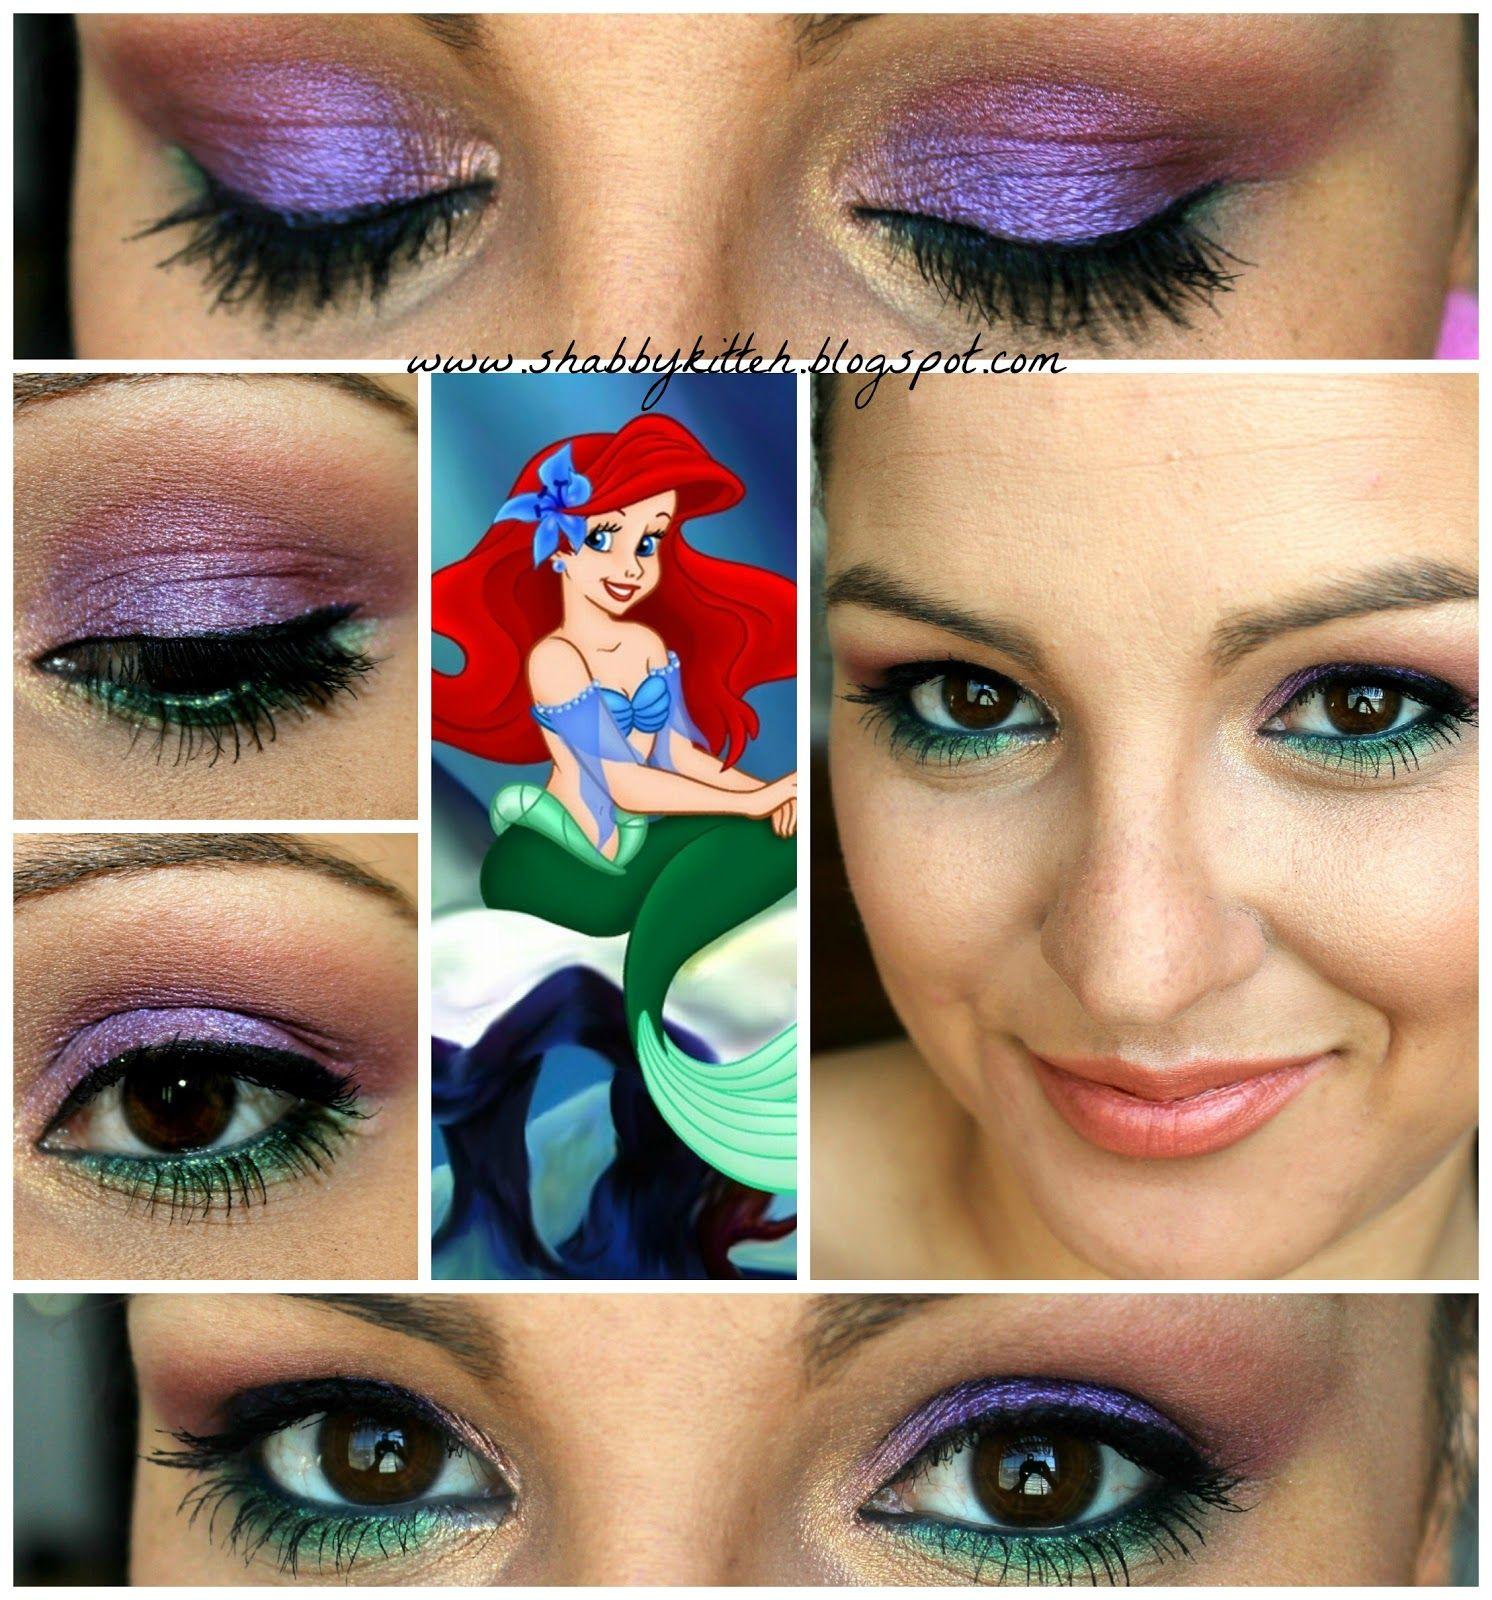 Disney Little Mermaid Makeup Tutorials, How to Beauty